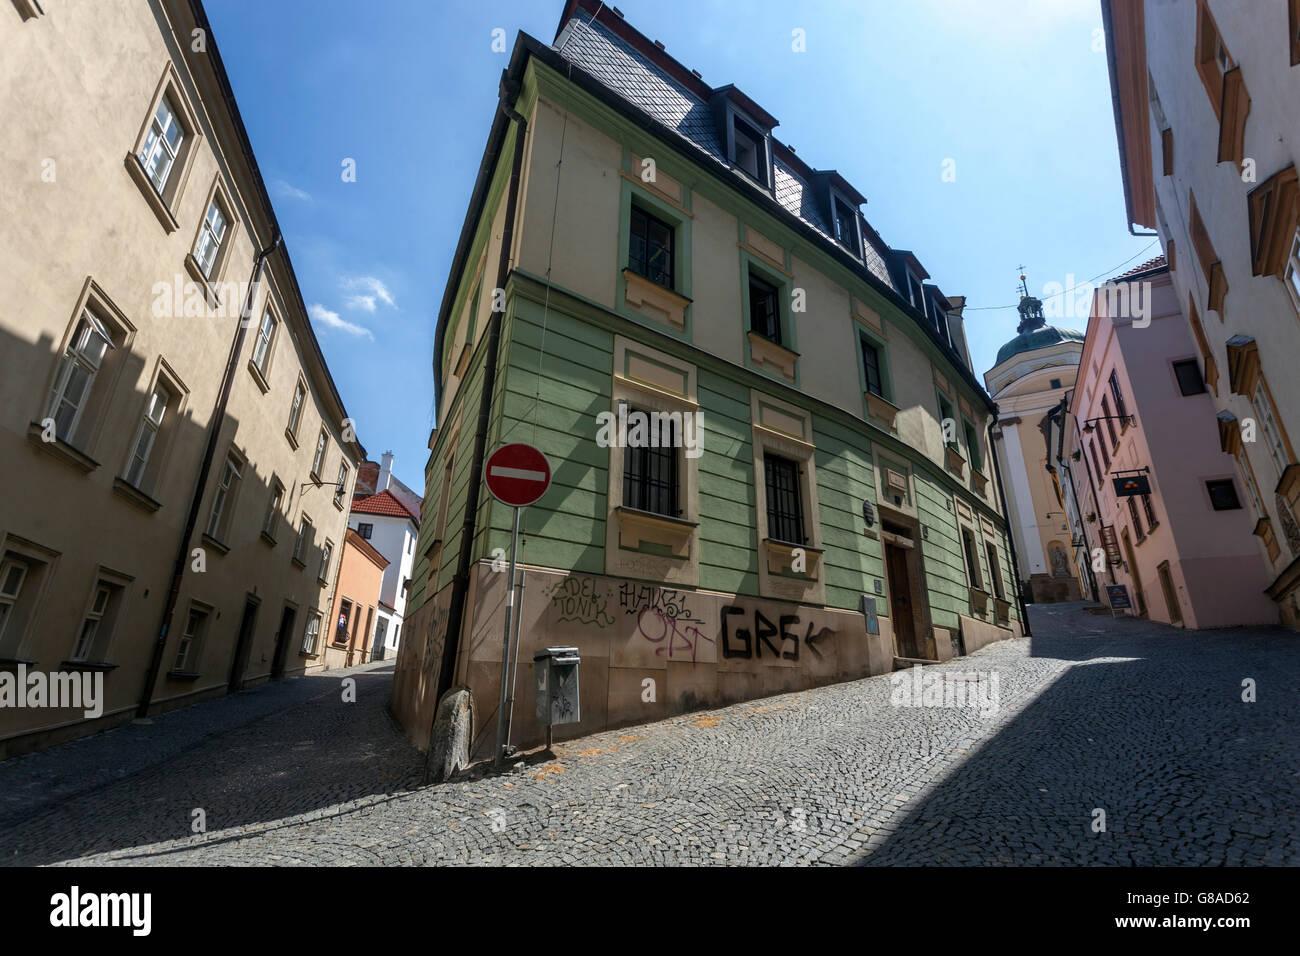 Old Town streets, Olomouc Region Hana, South Moravia, Czech Republic - Stock Image